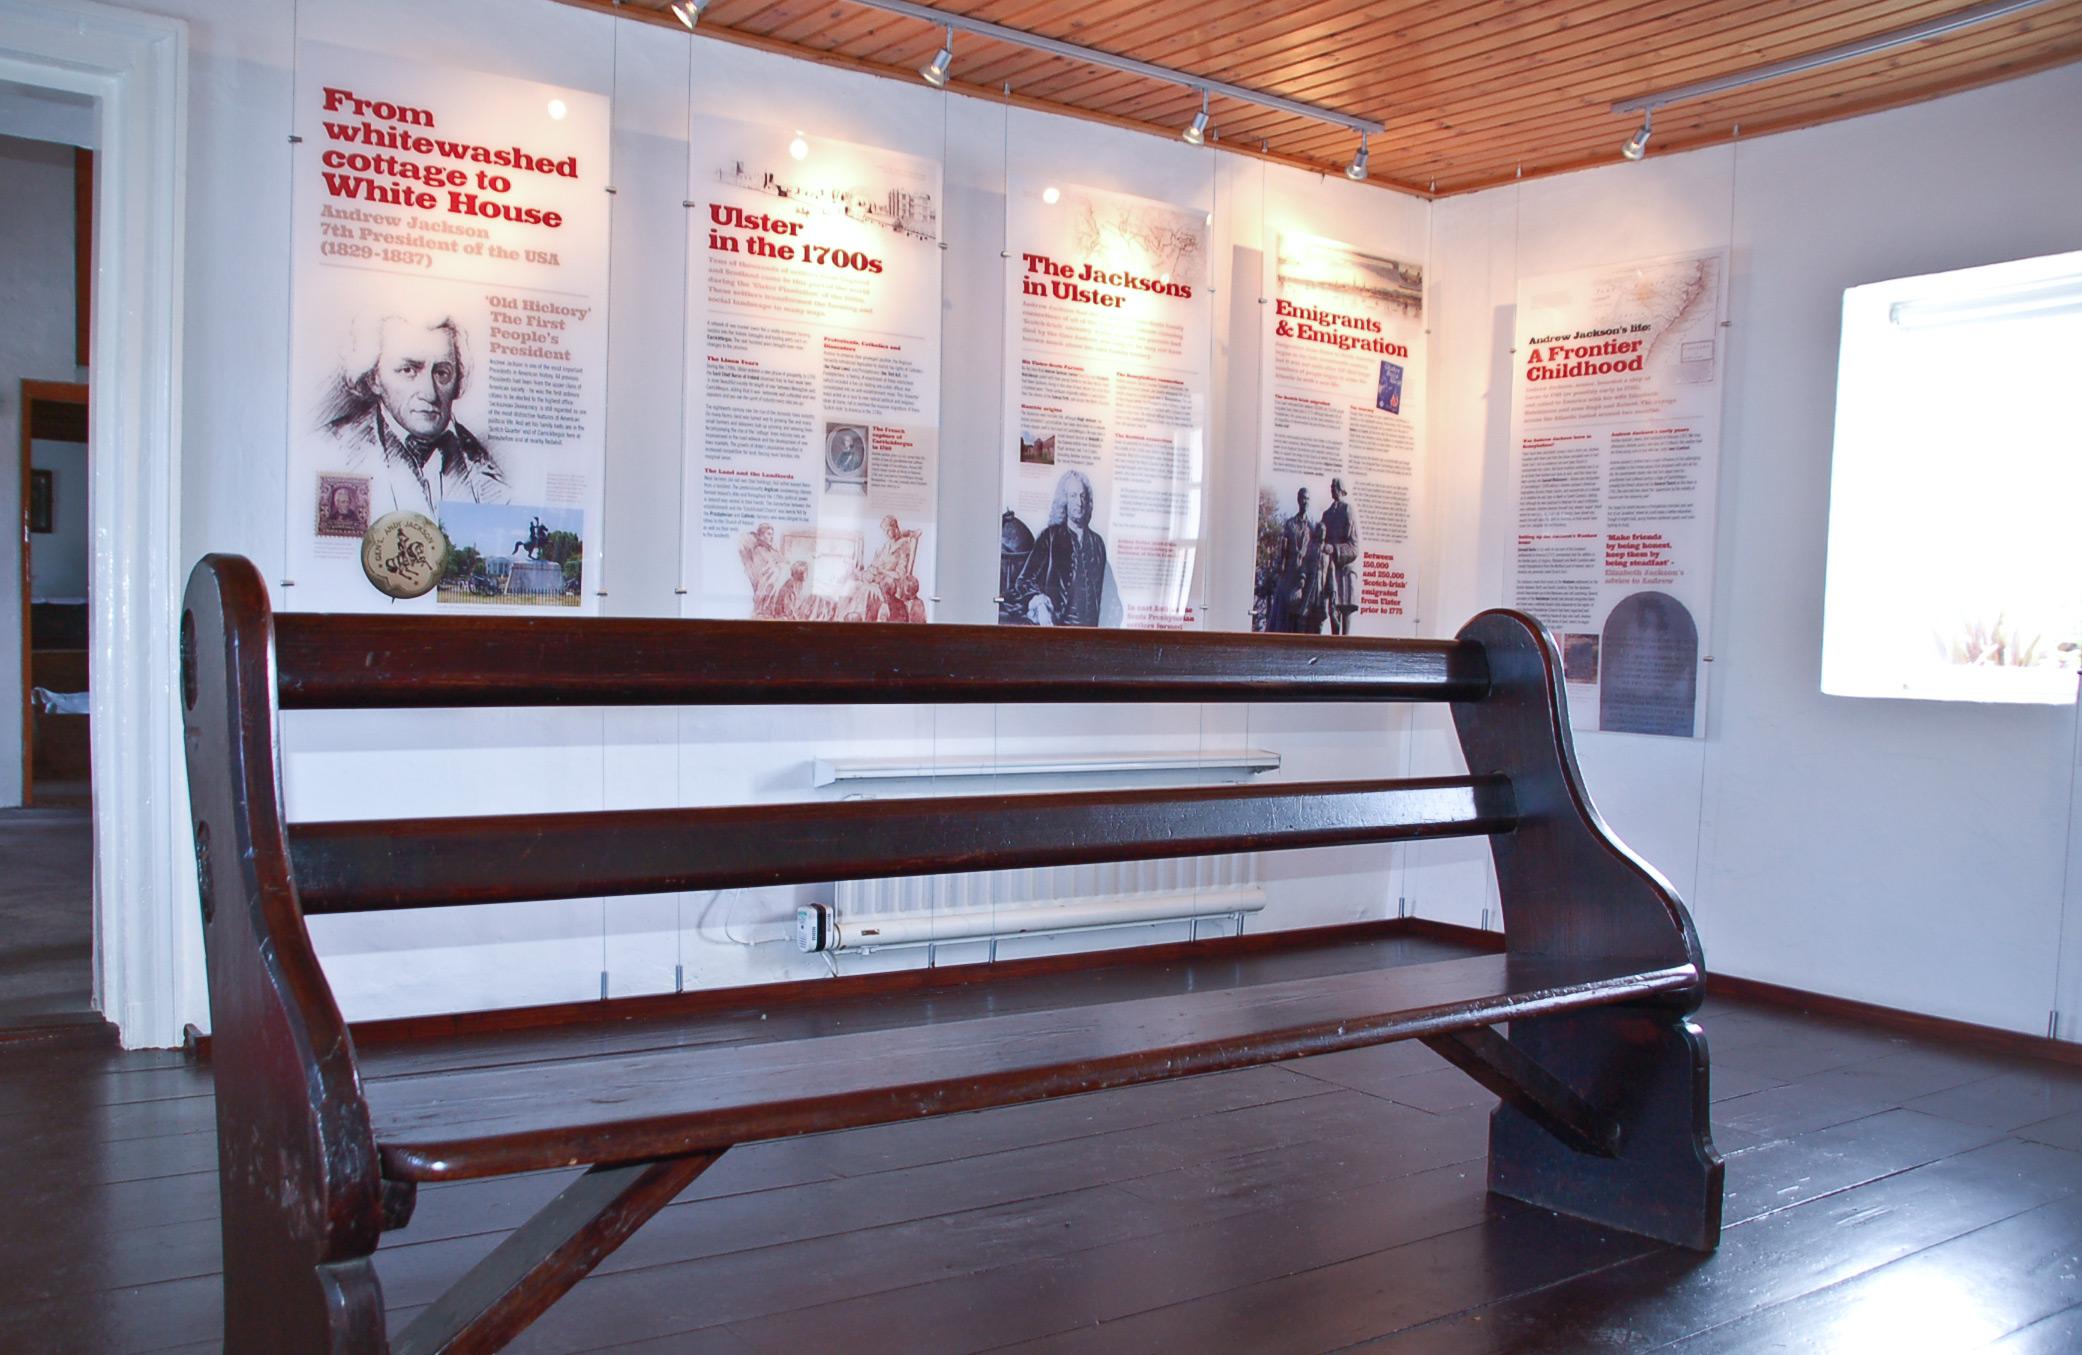 Jackson Centre Project Image 2